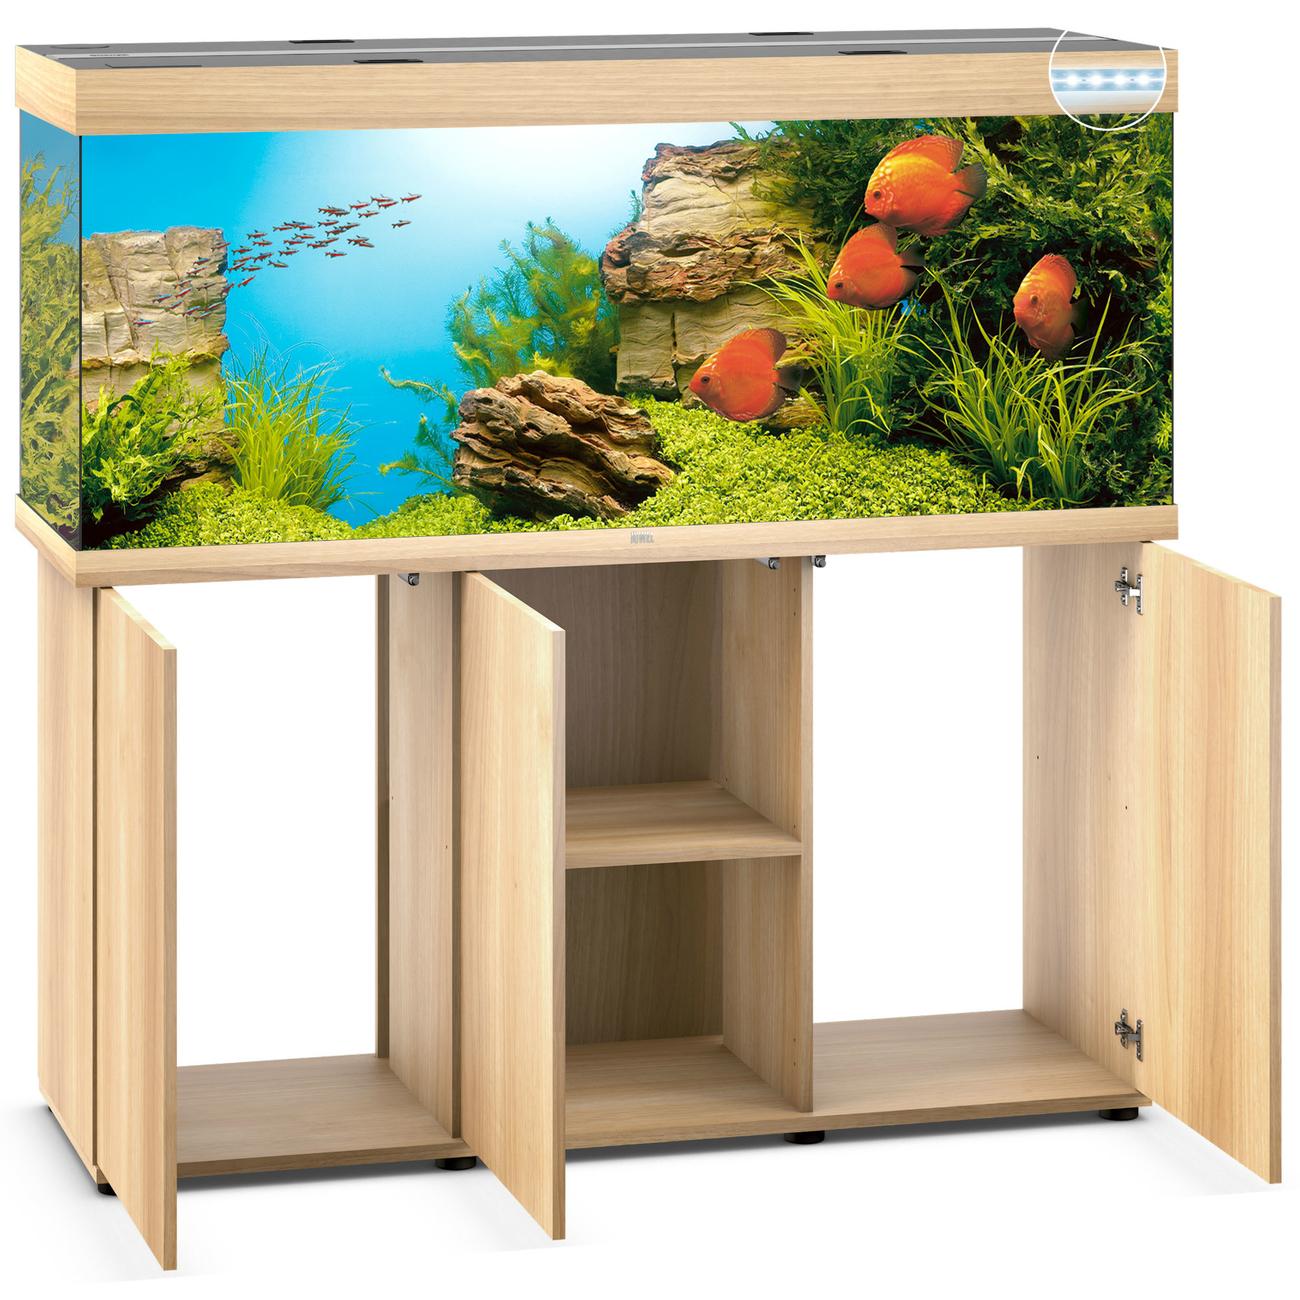 Juwel Rio 450 LED Aquarium mit Unterschrank, Bild 5